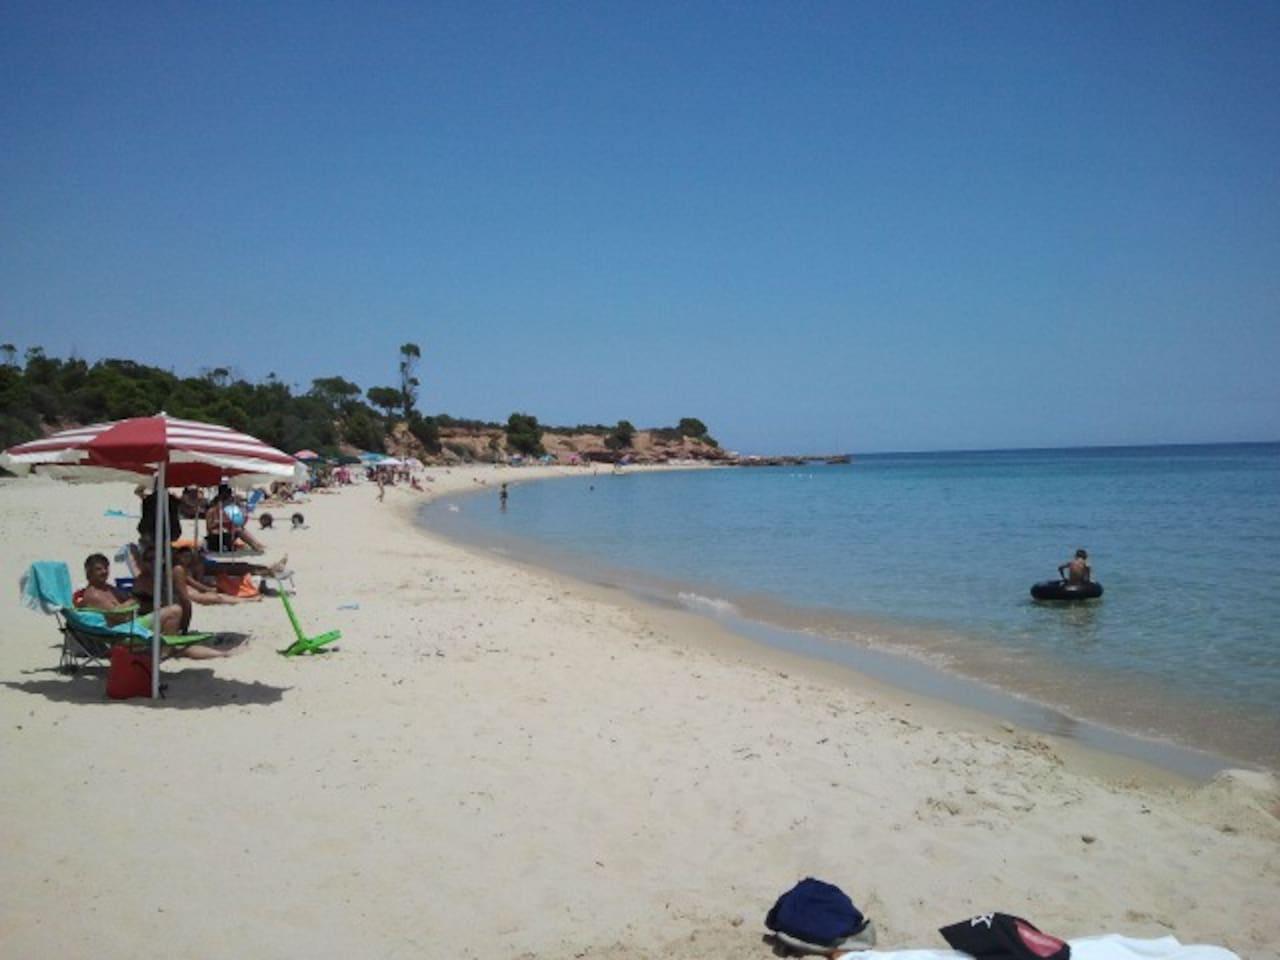 The local beach during summer.